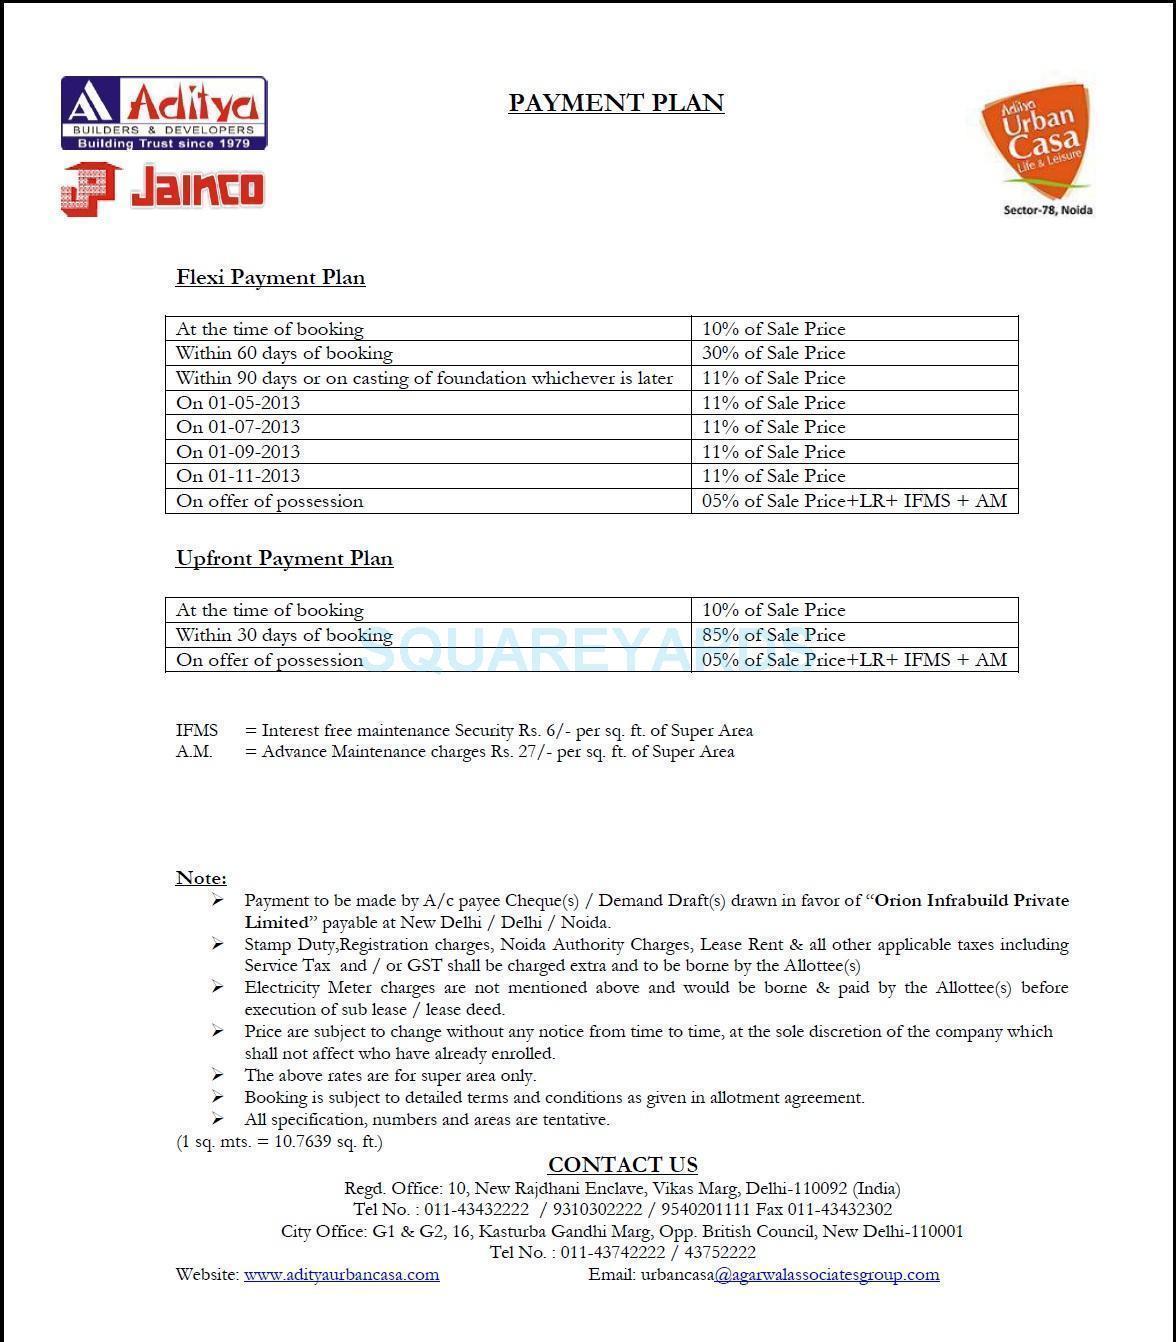 aditya urban casa payment plan image2